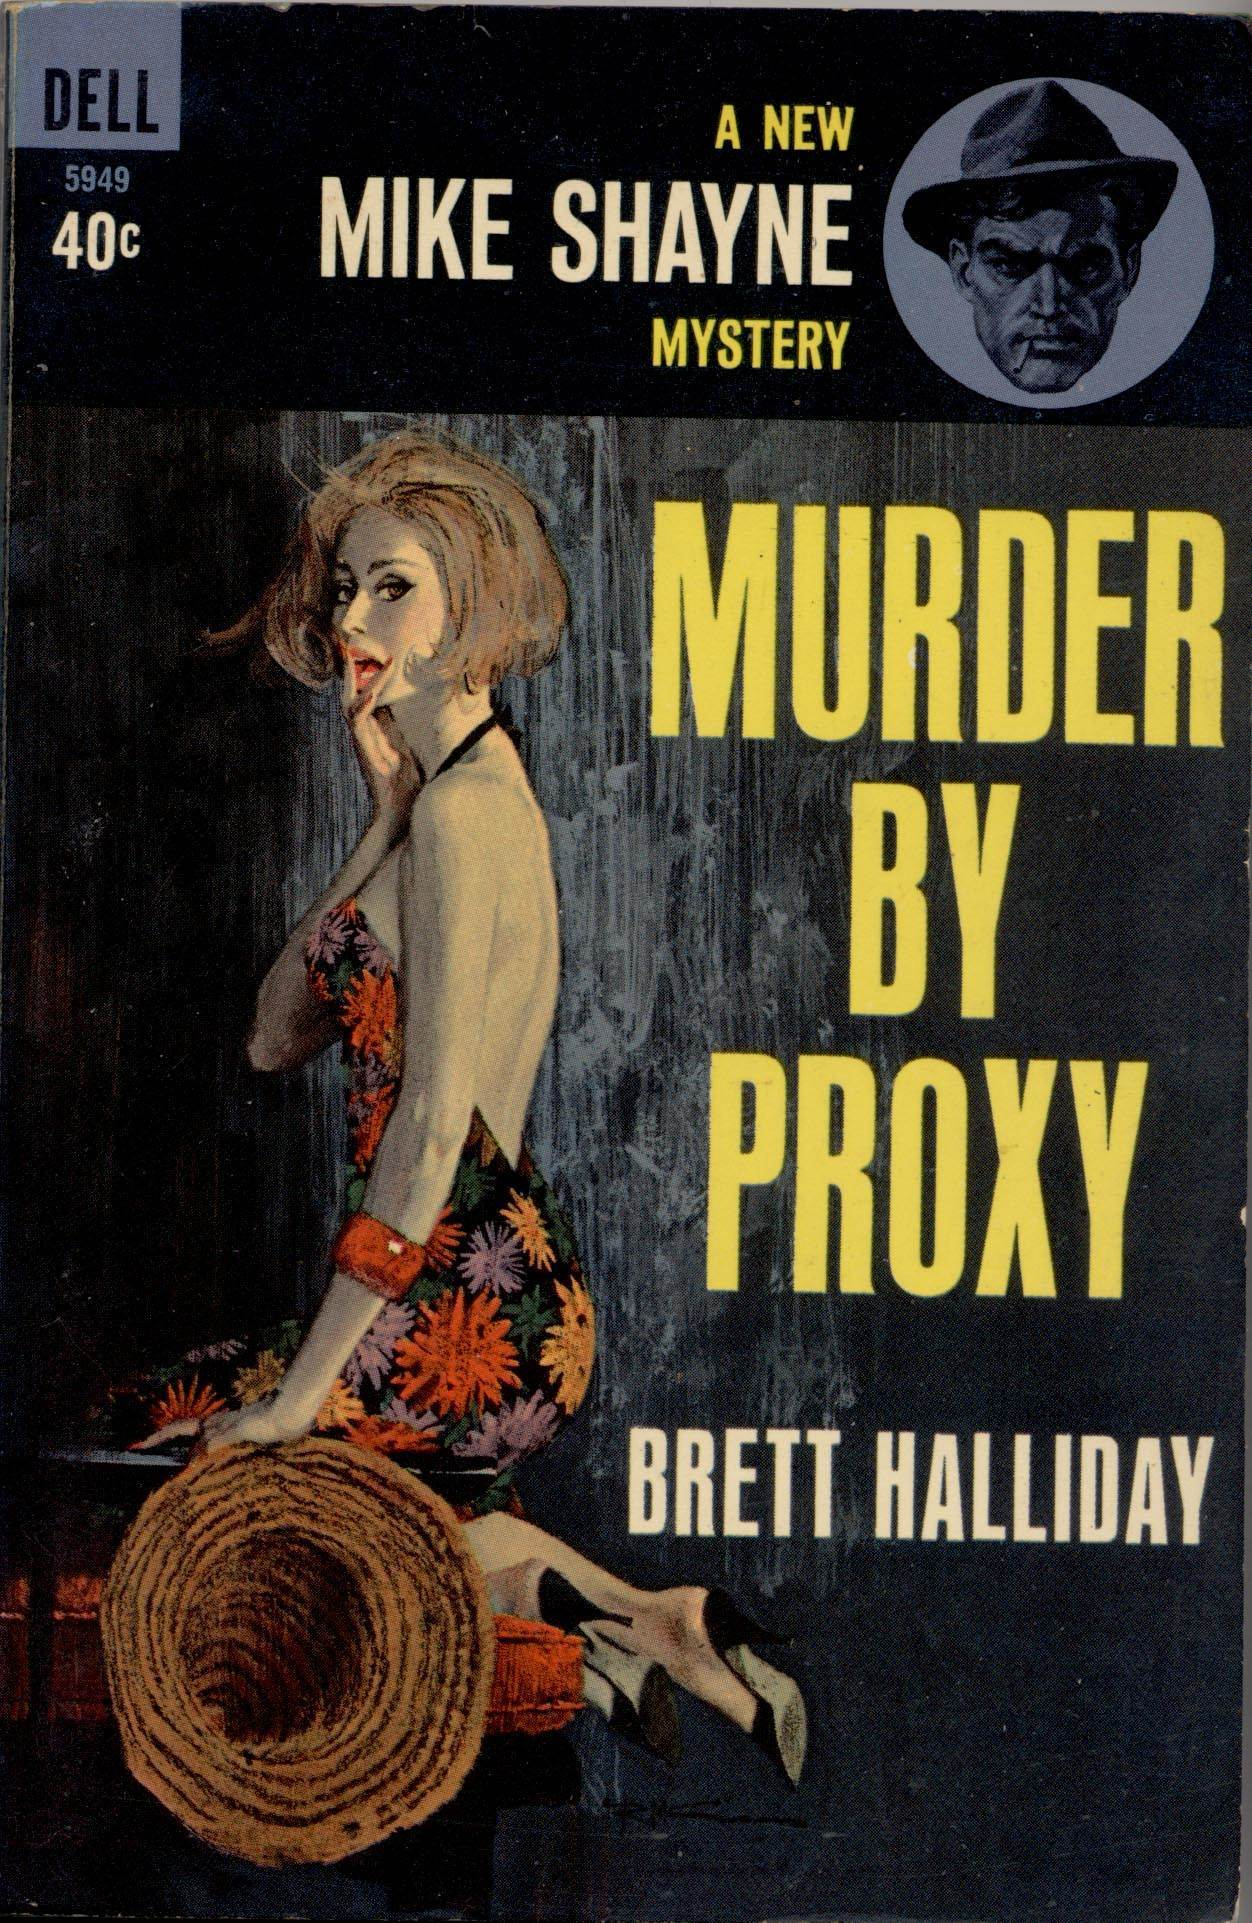 1963-Murder-by-Proxy-by-Brett-Halliday.-Cover-art-by-Robert-McGinnis.jpg